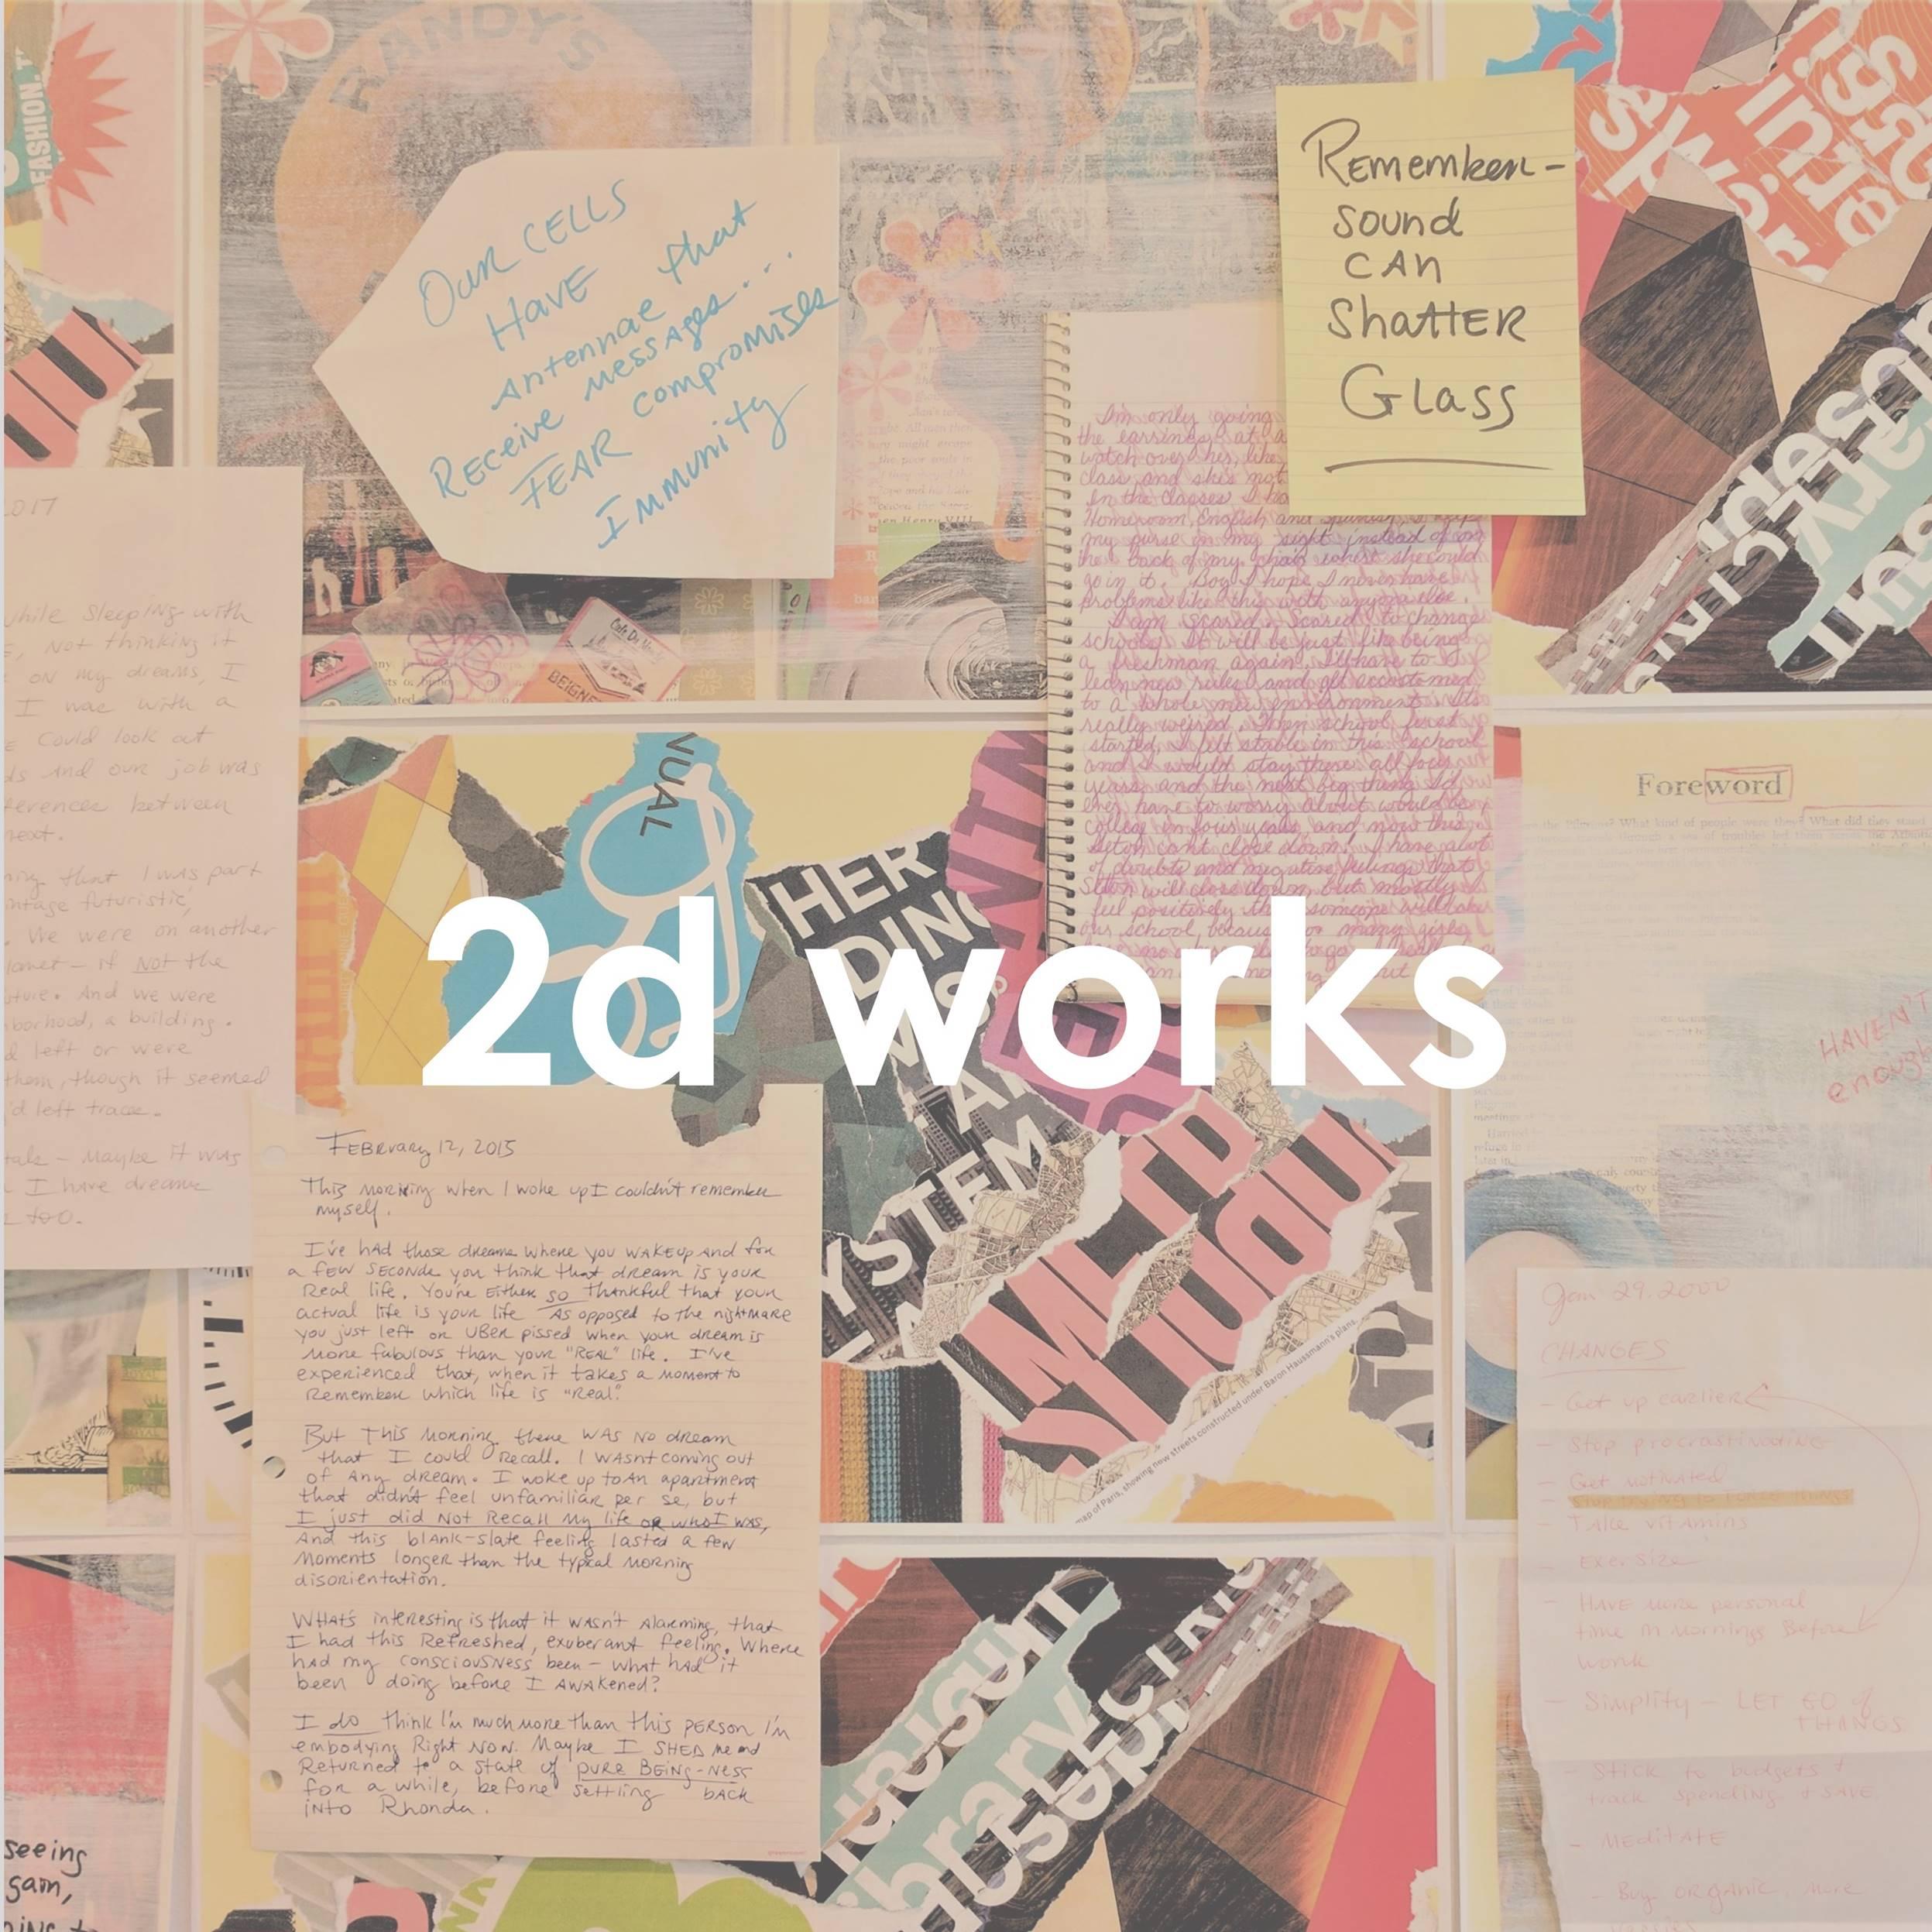 2d_works_A.JPG